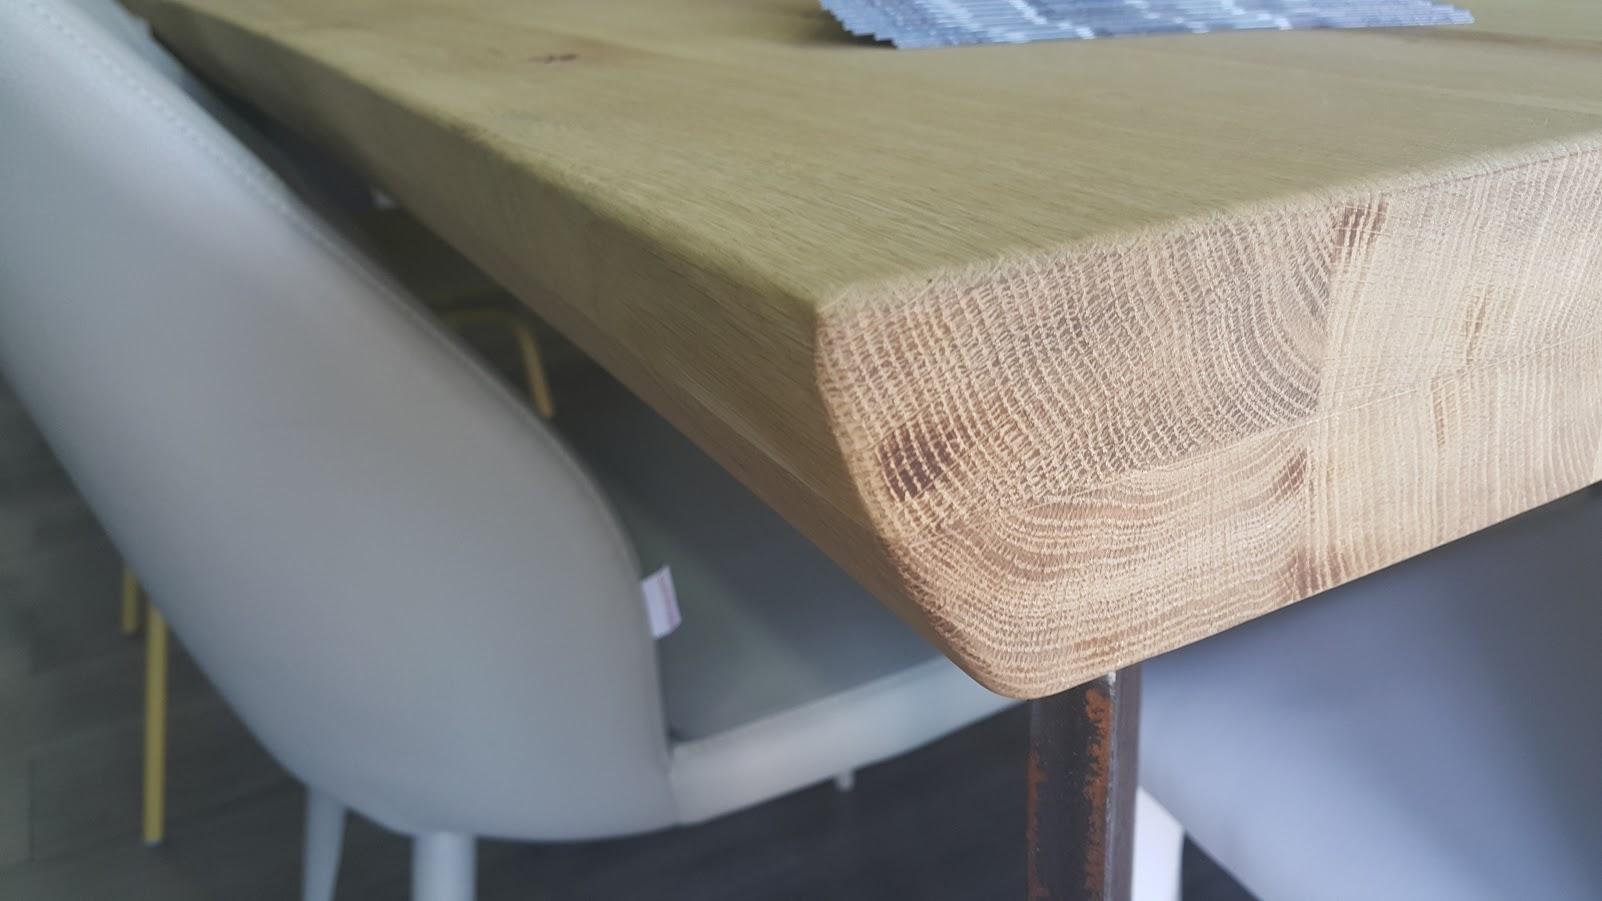 devina nais tavoli - 28 images - devina nais tavolo master ...